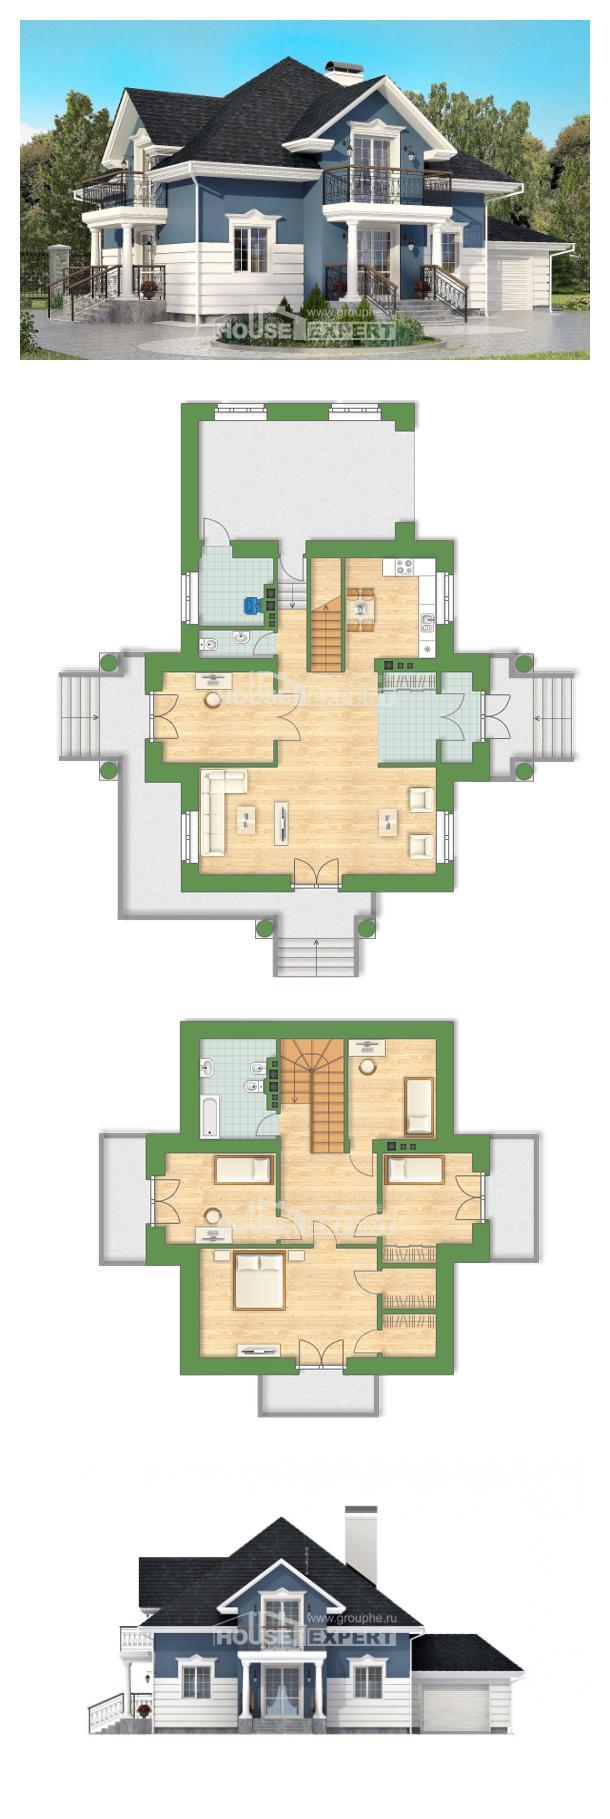 Projekt domu 180-002-R   House Expert